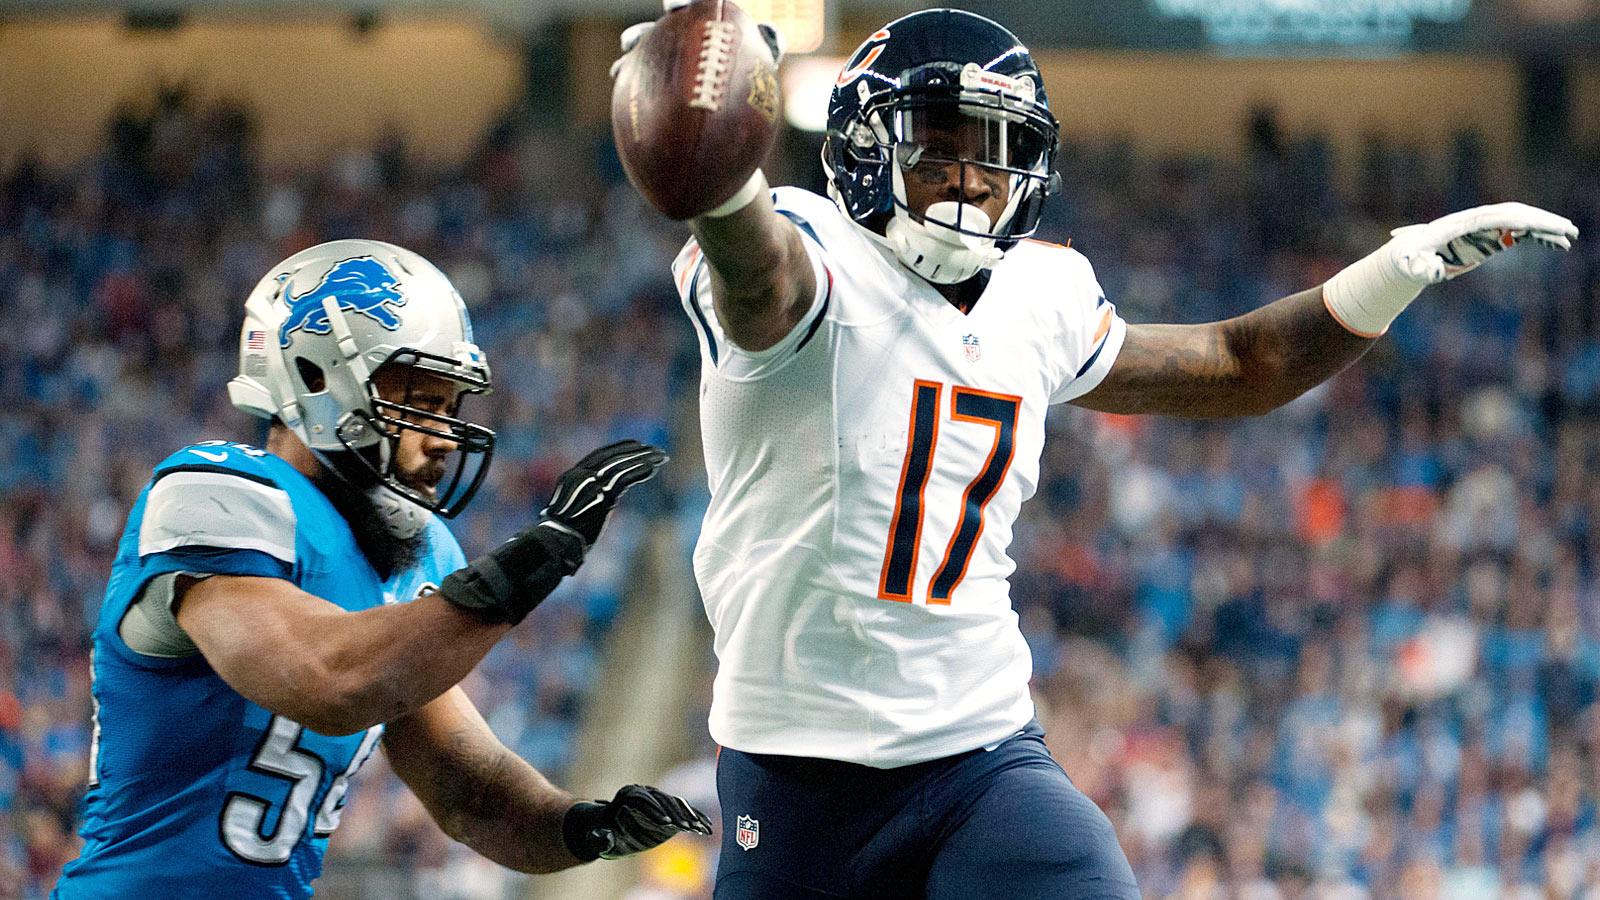 NFL Quick Hits: Bears' Jeffery headlines Week 1 concerns